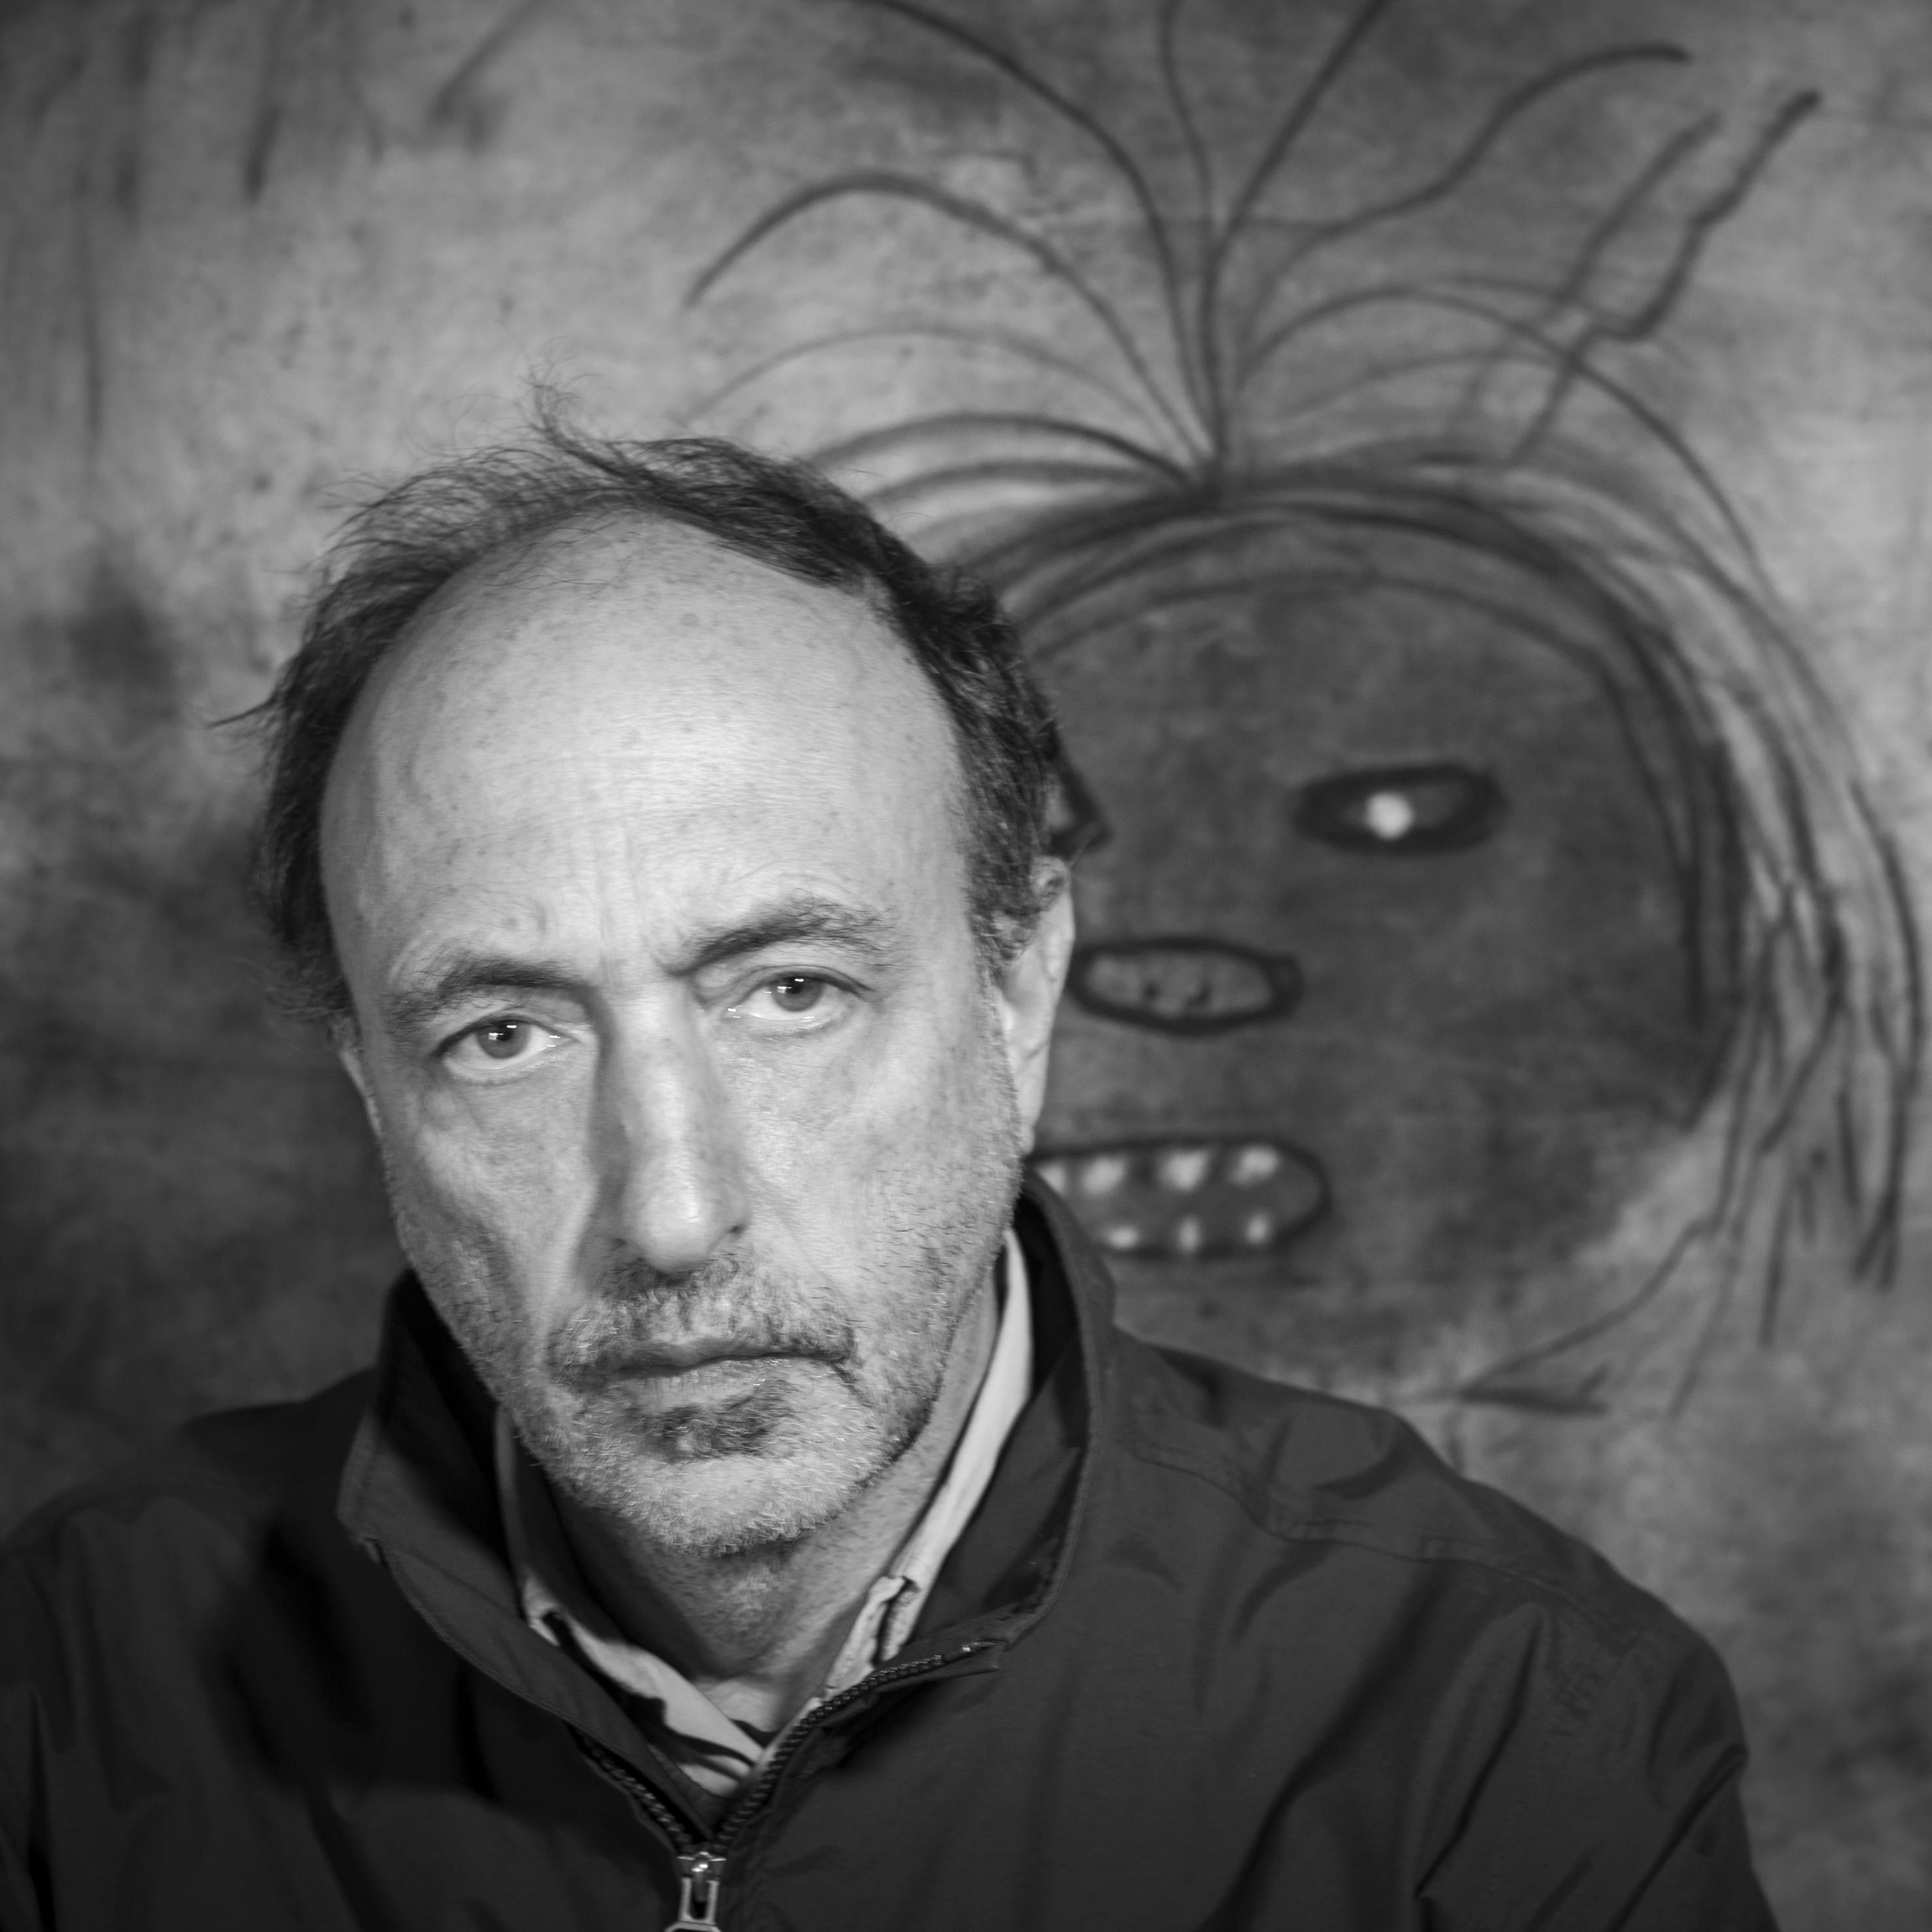 Roger Ballen (c) Marguerite Rossouw - CENTRALE for contemporary art